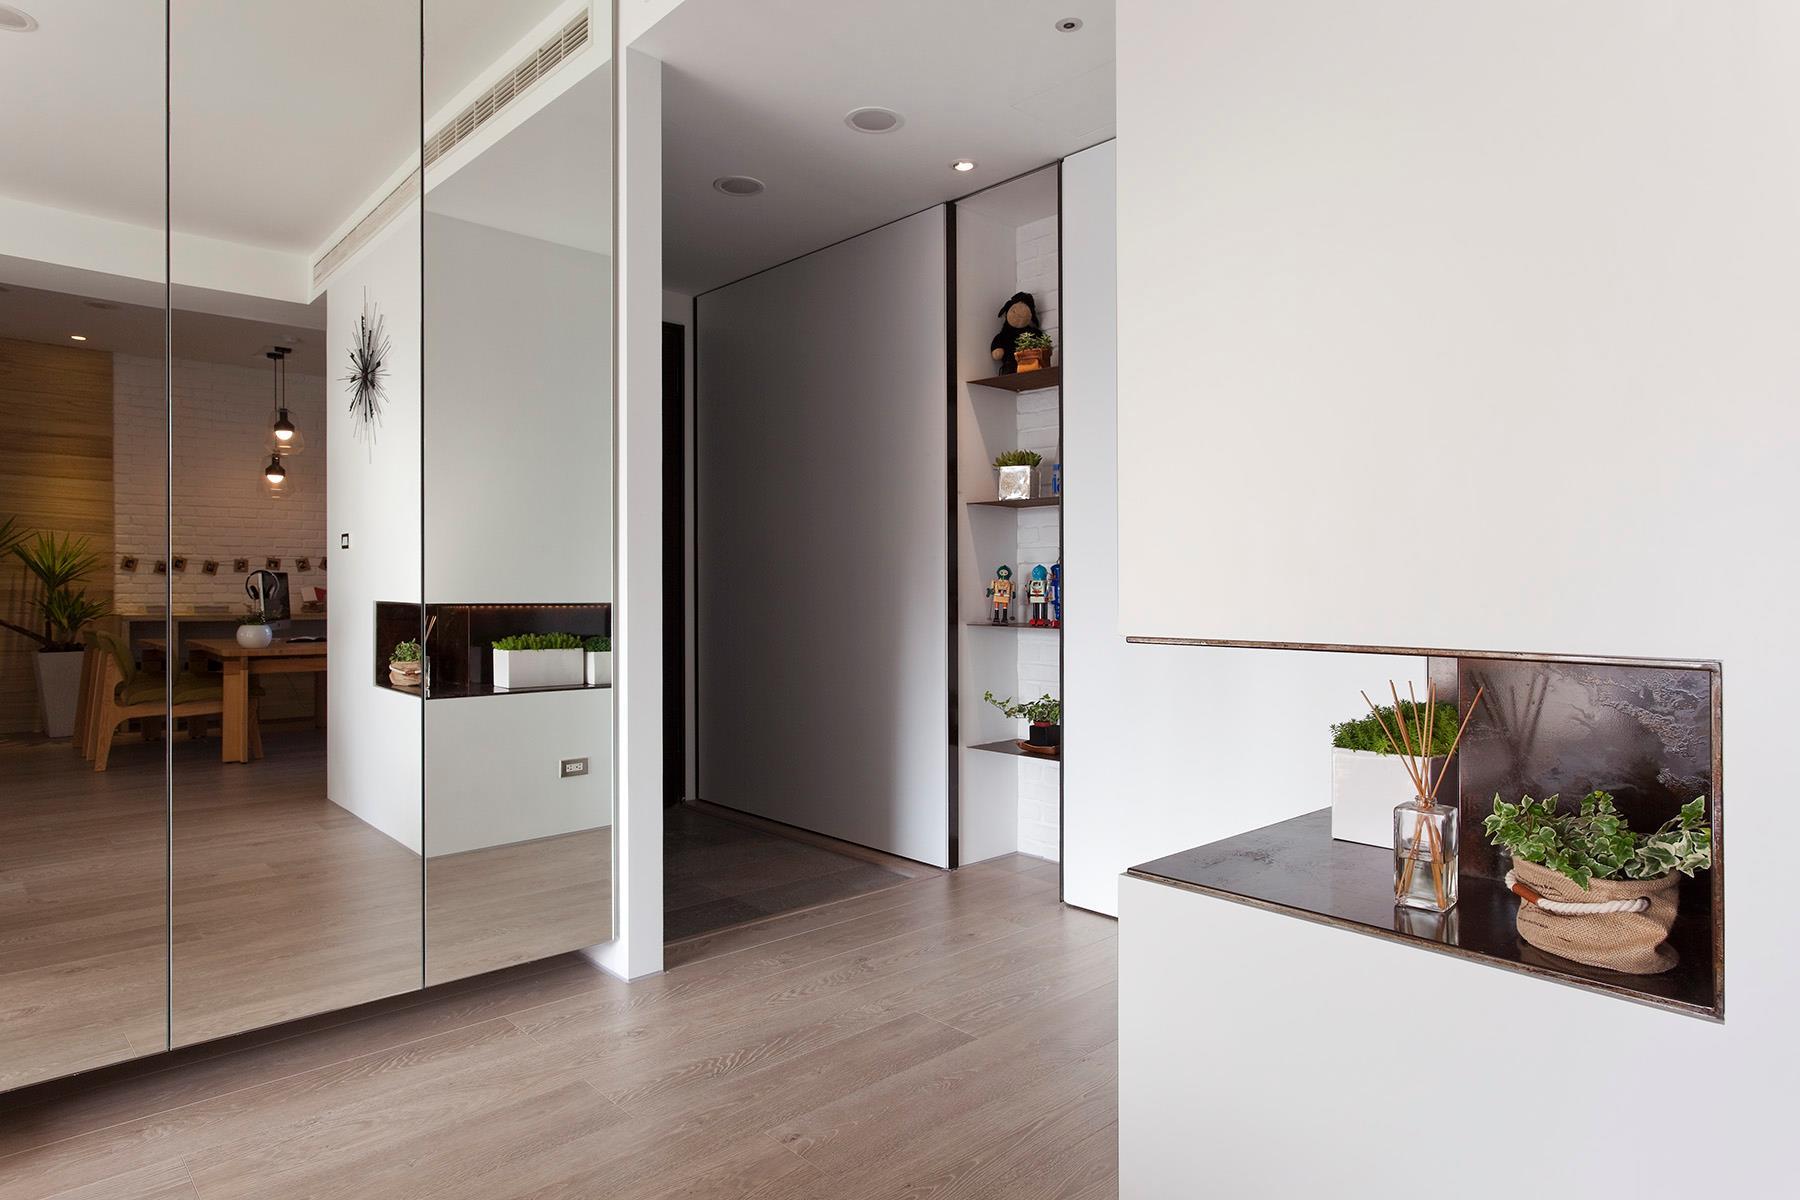 Однокомнатная квартира 40 кв м со шкафом